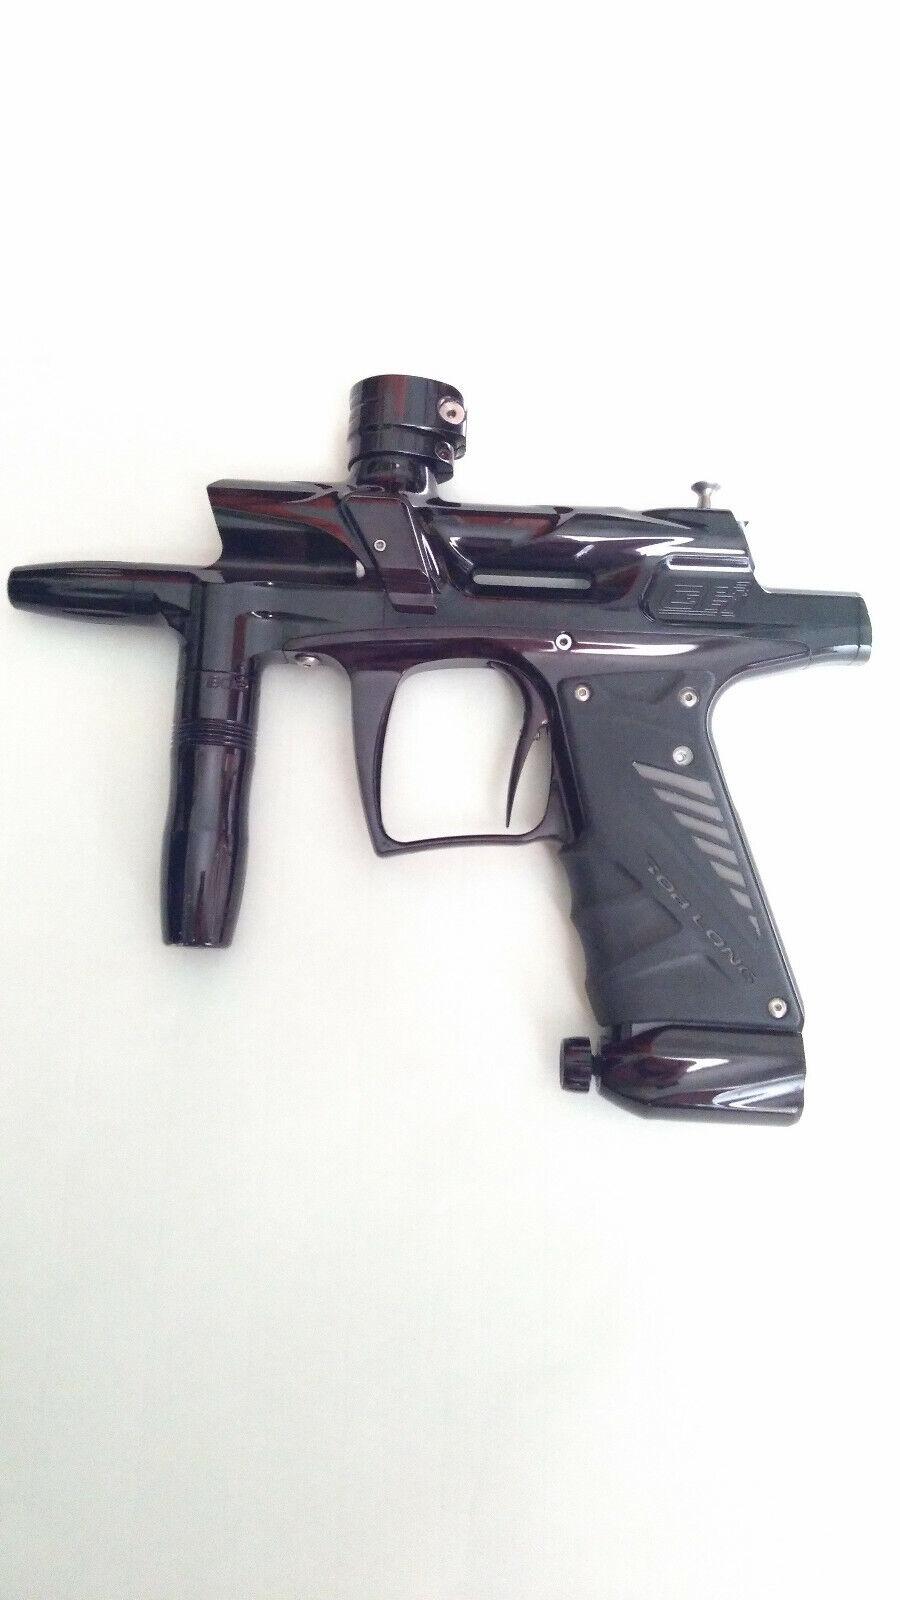 2010 Bob Long G6R Electronic Paintball Marker Gun